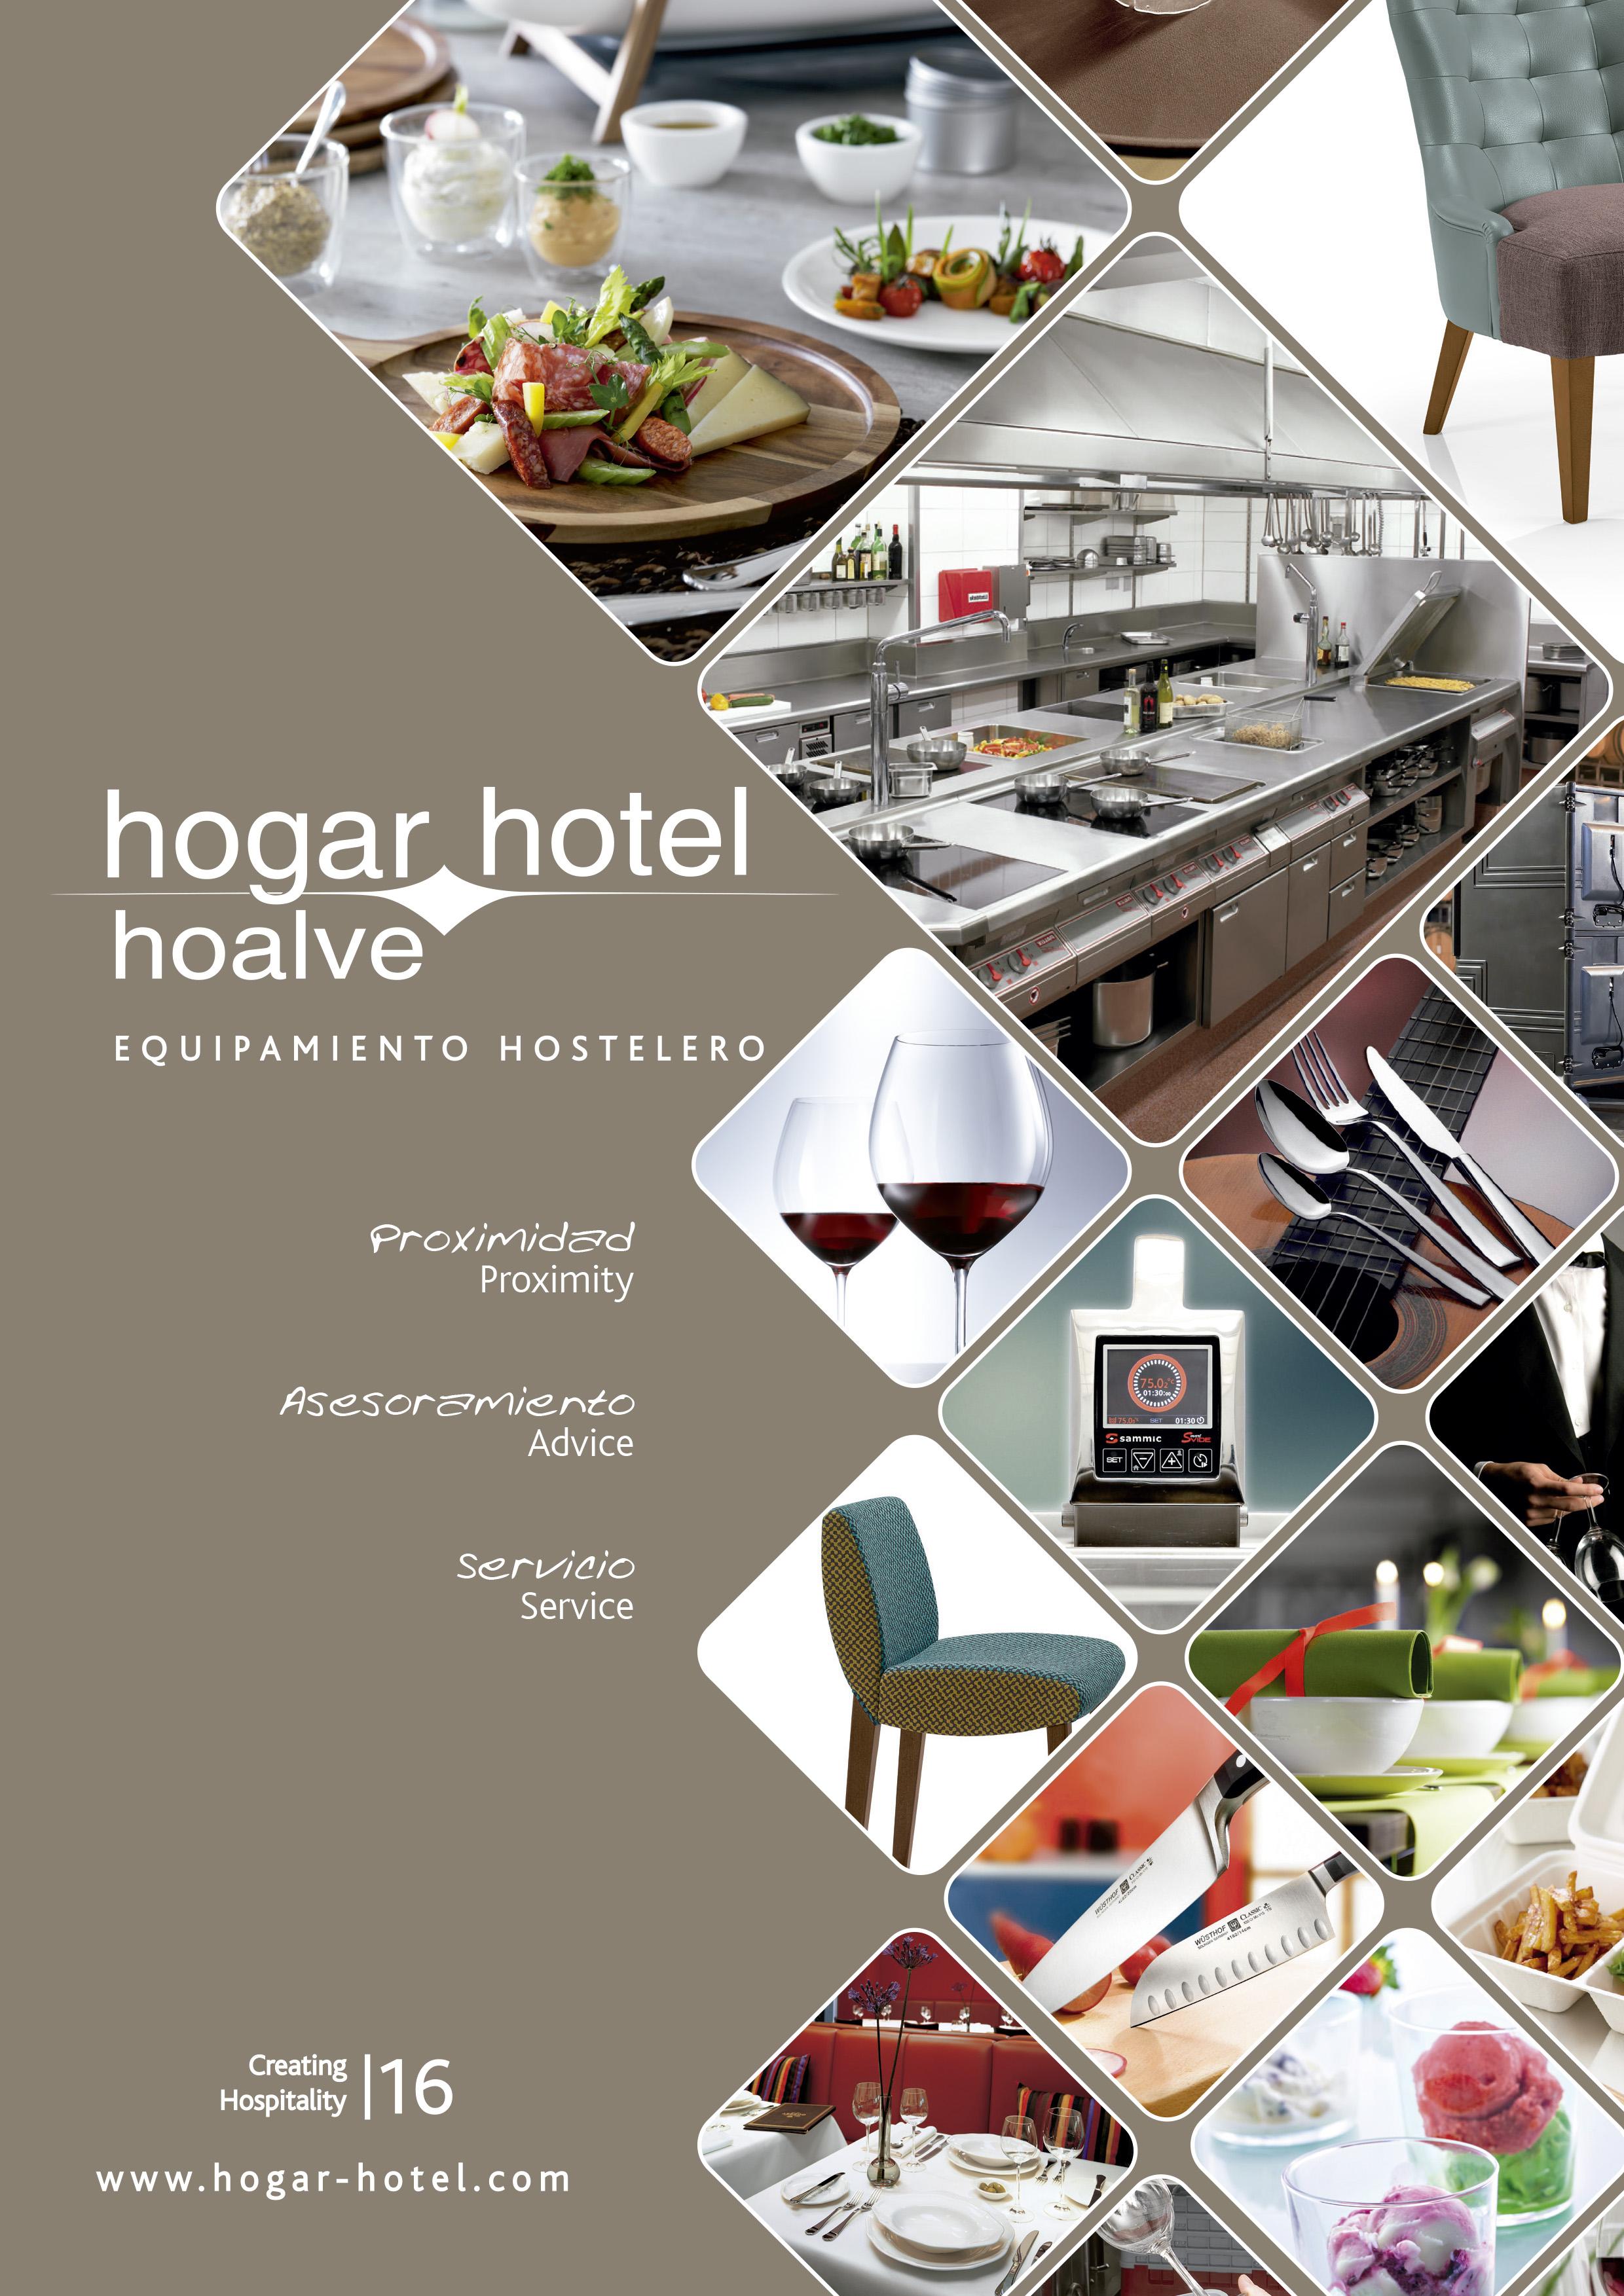 Ofertas y cat logos hogar hotel almer a s l for Modelo de catalogo de productos